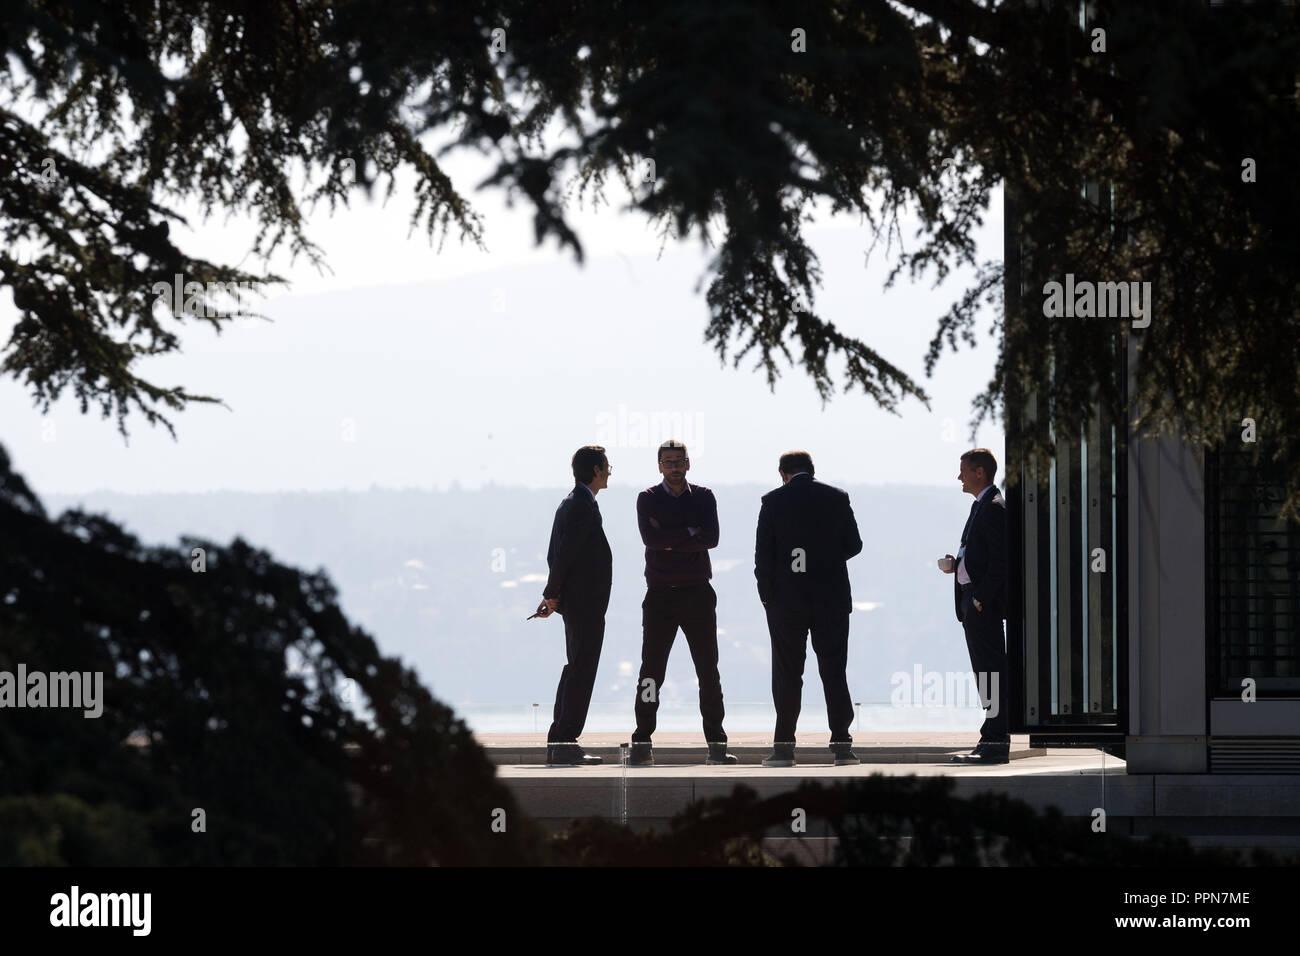 27 September 2018, Switzerland, Nyon: Four men in dark suits